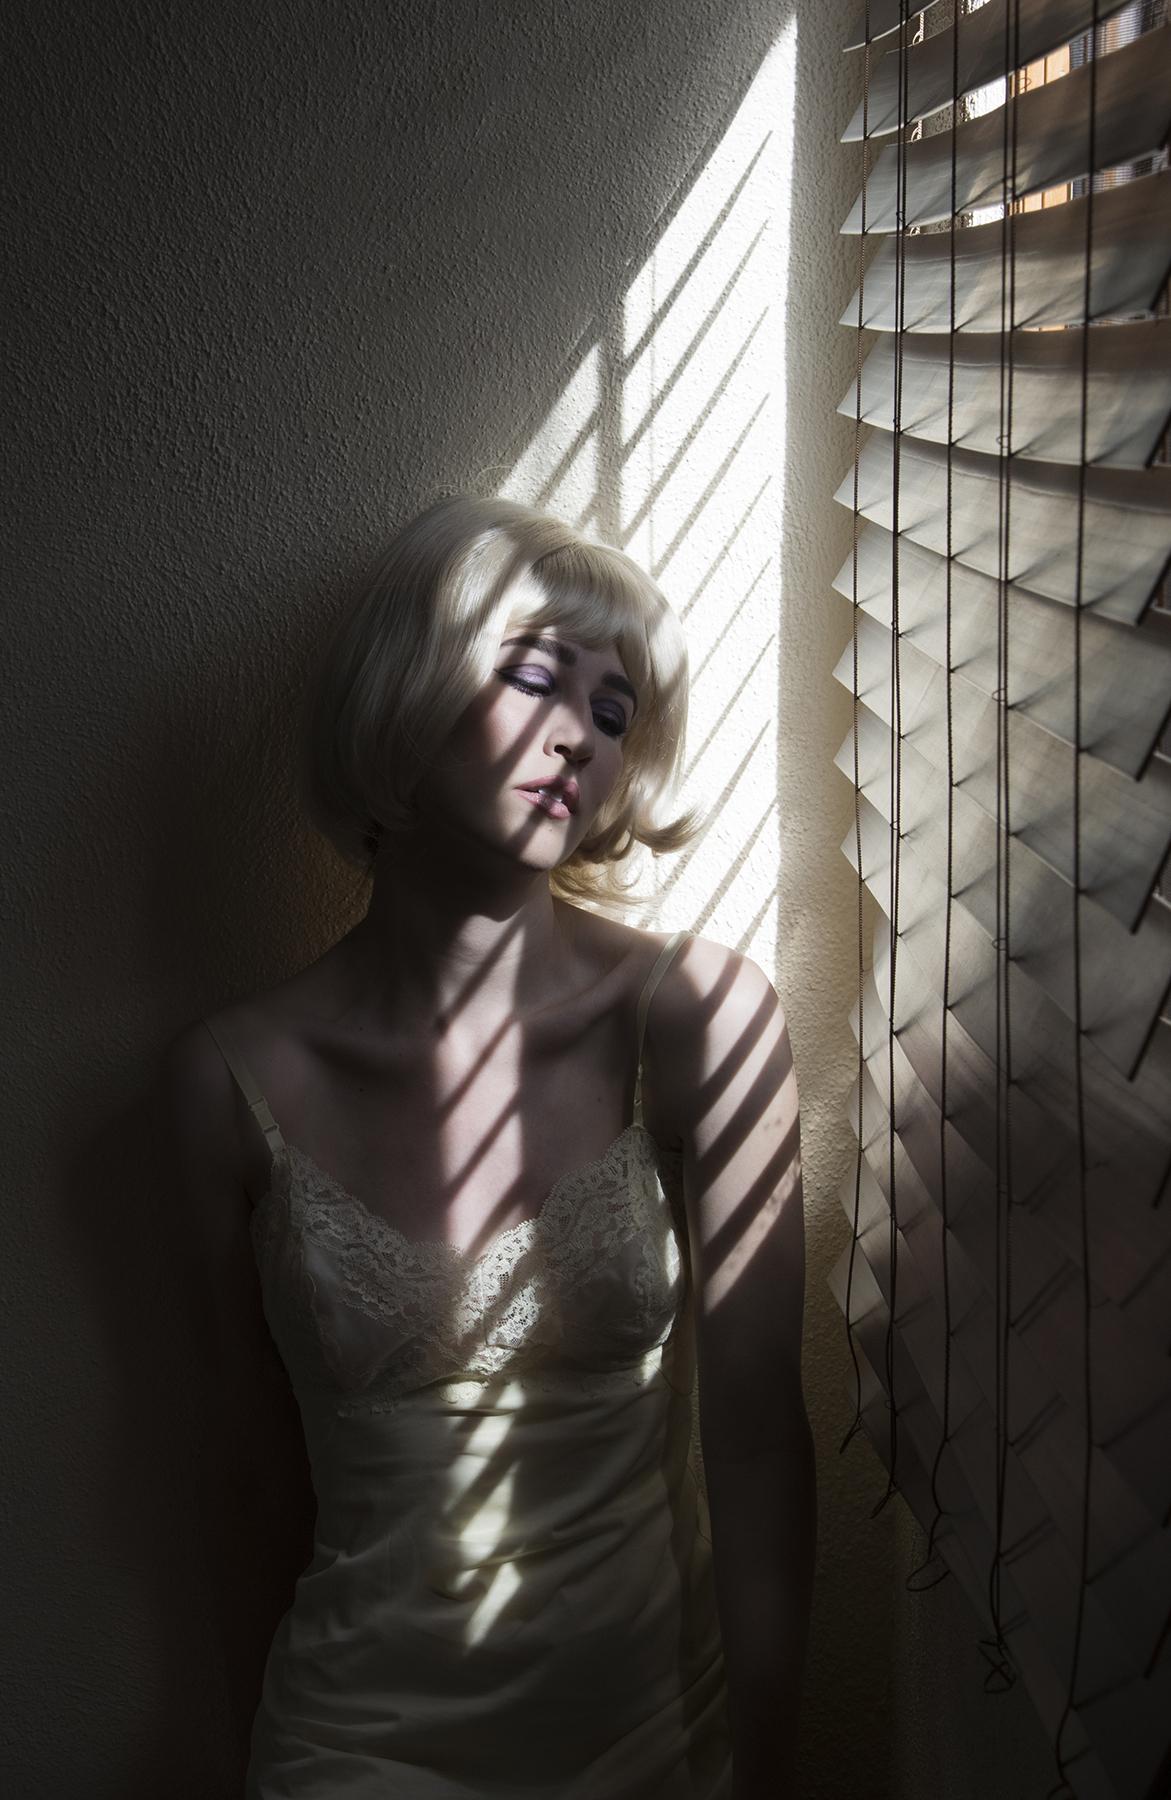 Nicole_Cudzilo_AmericanBaby_Window_1.jpg